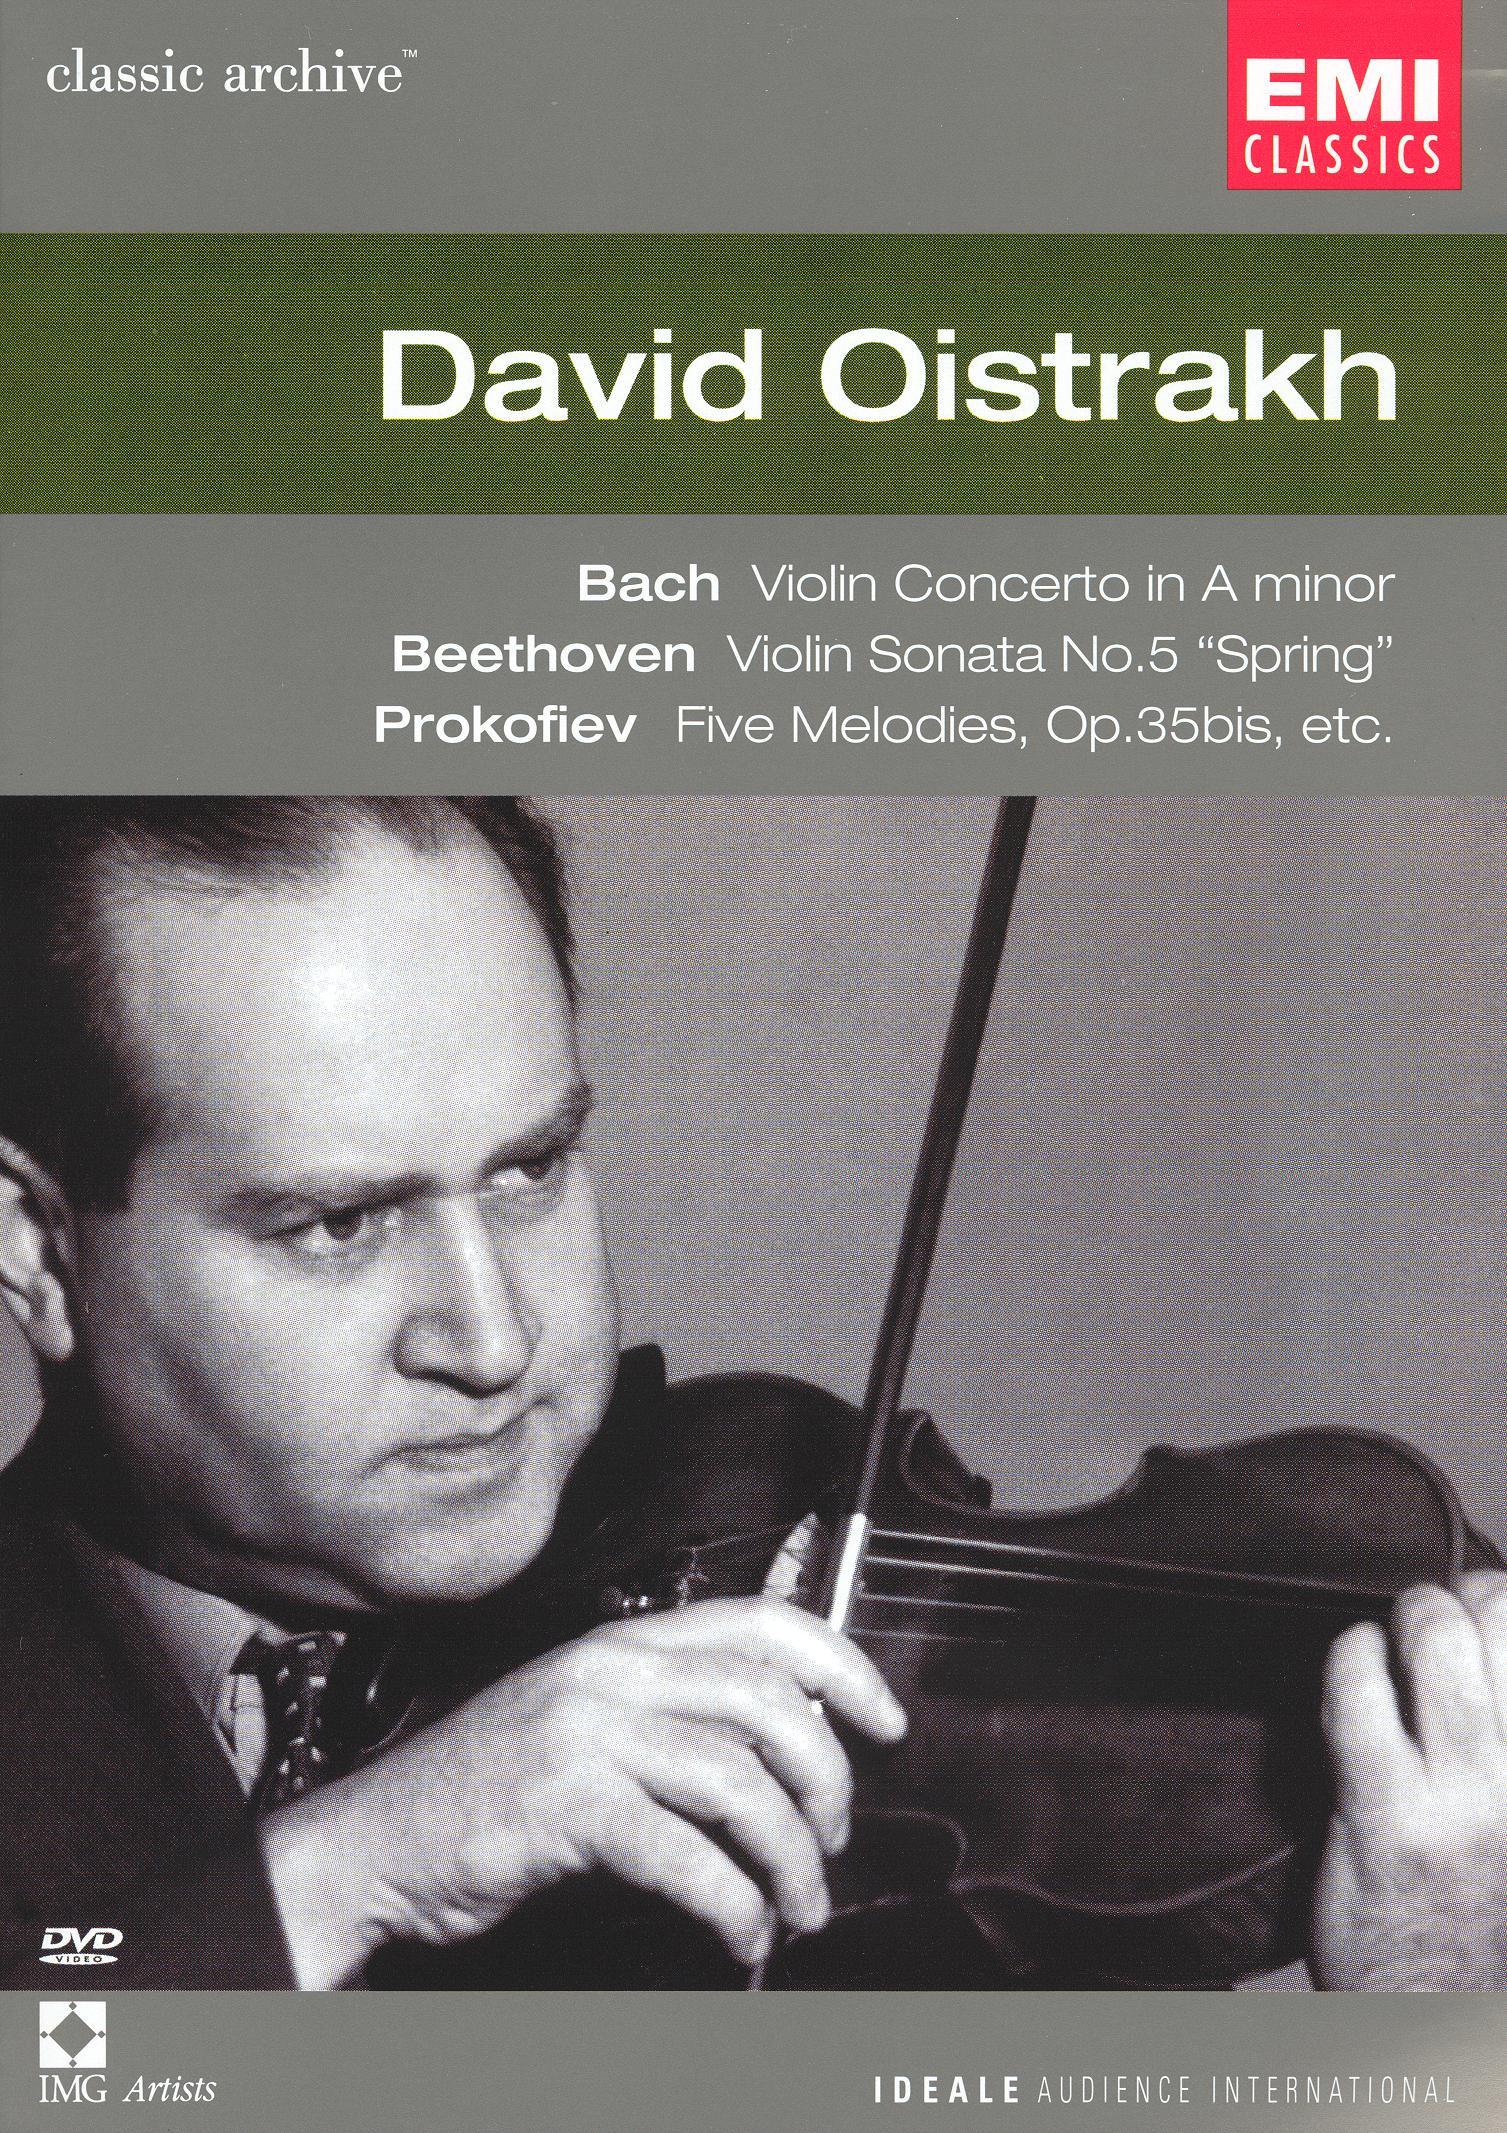 Classic Archive: David Oistrakh